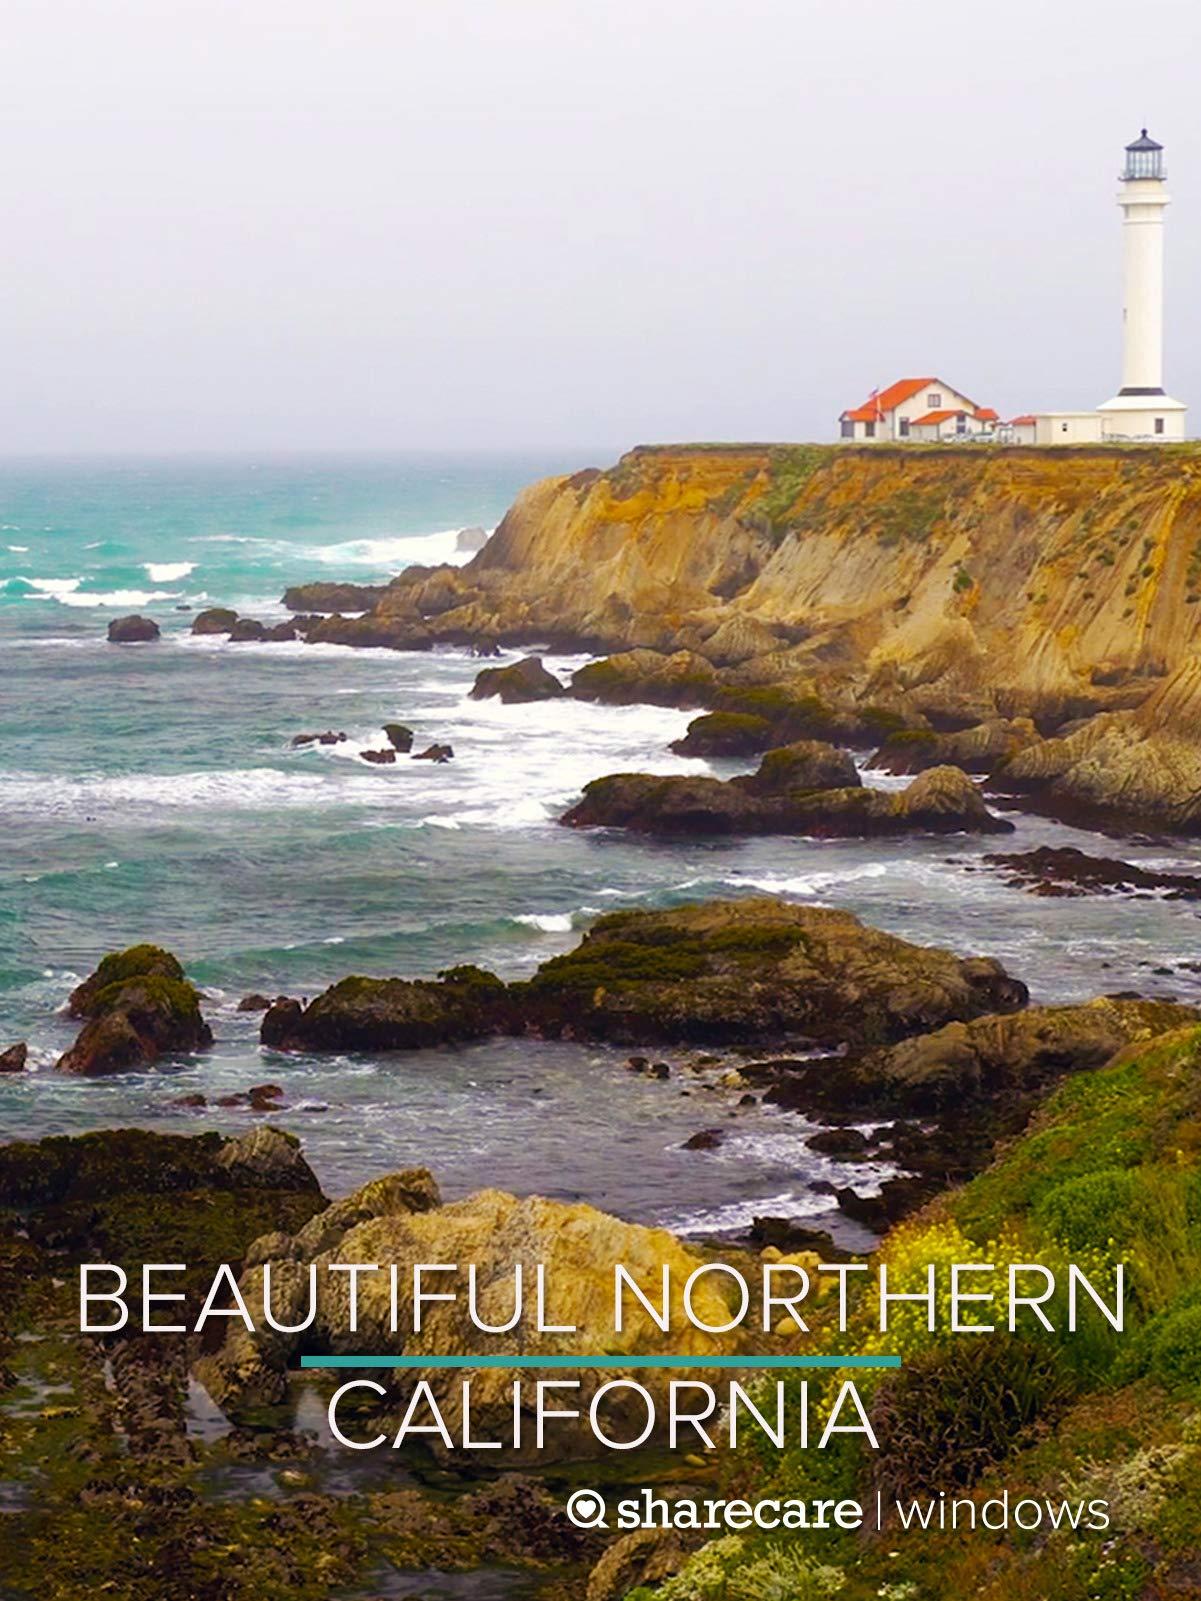 Beautiful Northern California with music